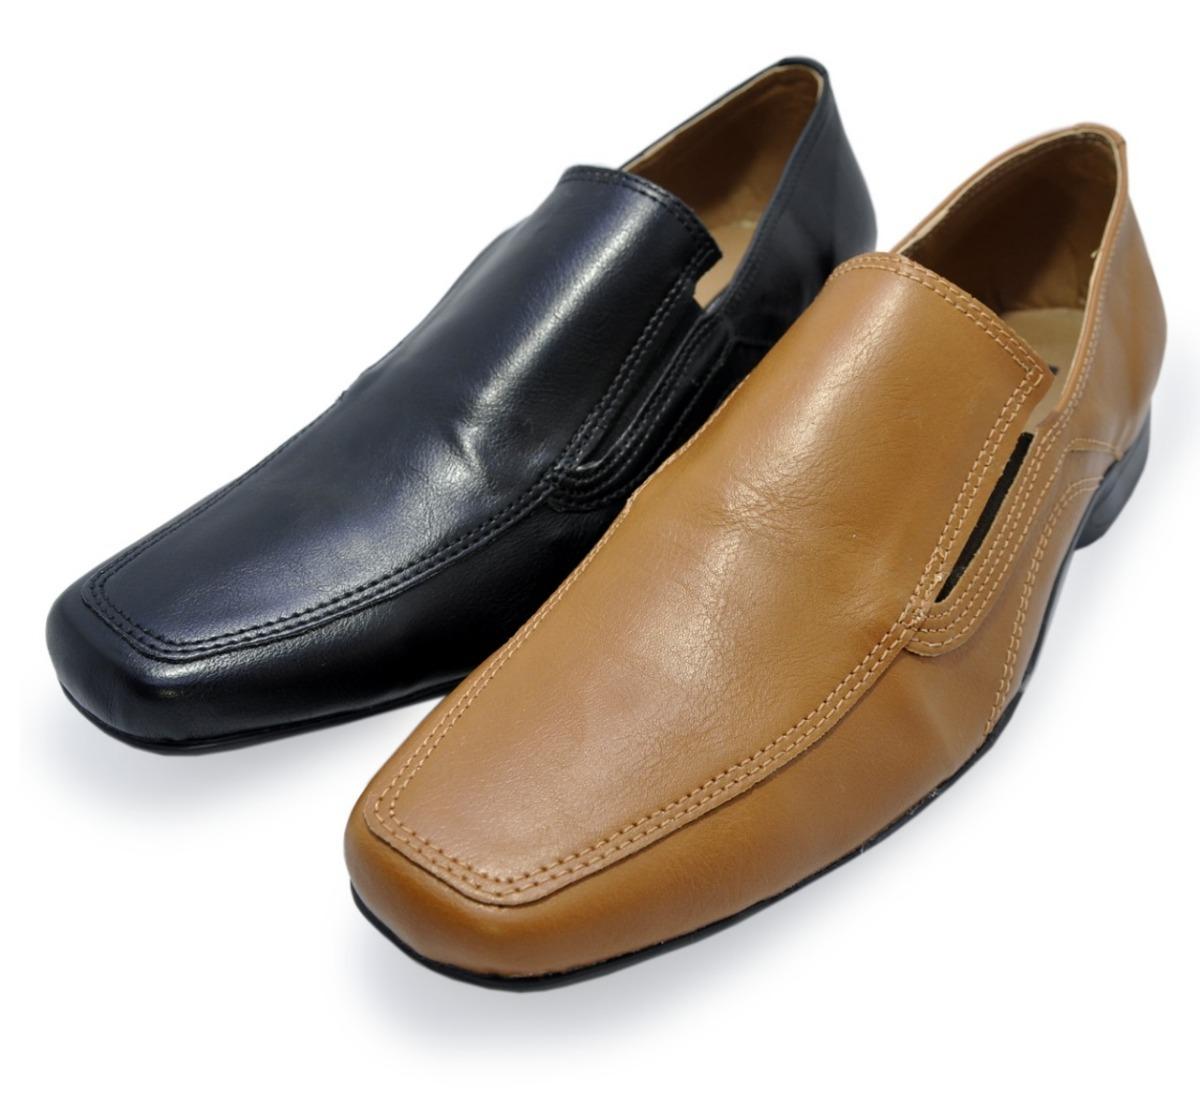 a8f642ddb9 zapato-de-vestir-hombre -moda-fiesta-sport-2-colores-D NQ NP 996118-MLA28280957106 102018-F.jpg